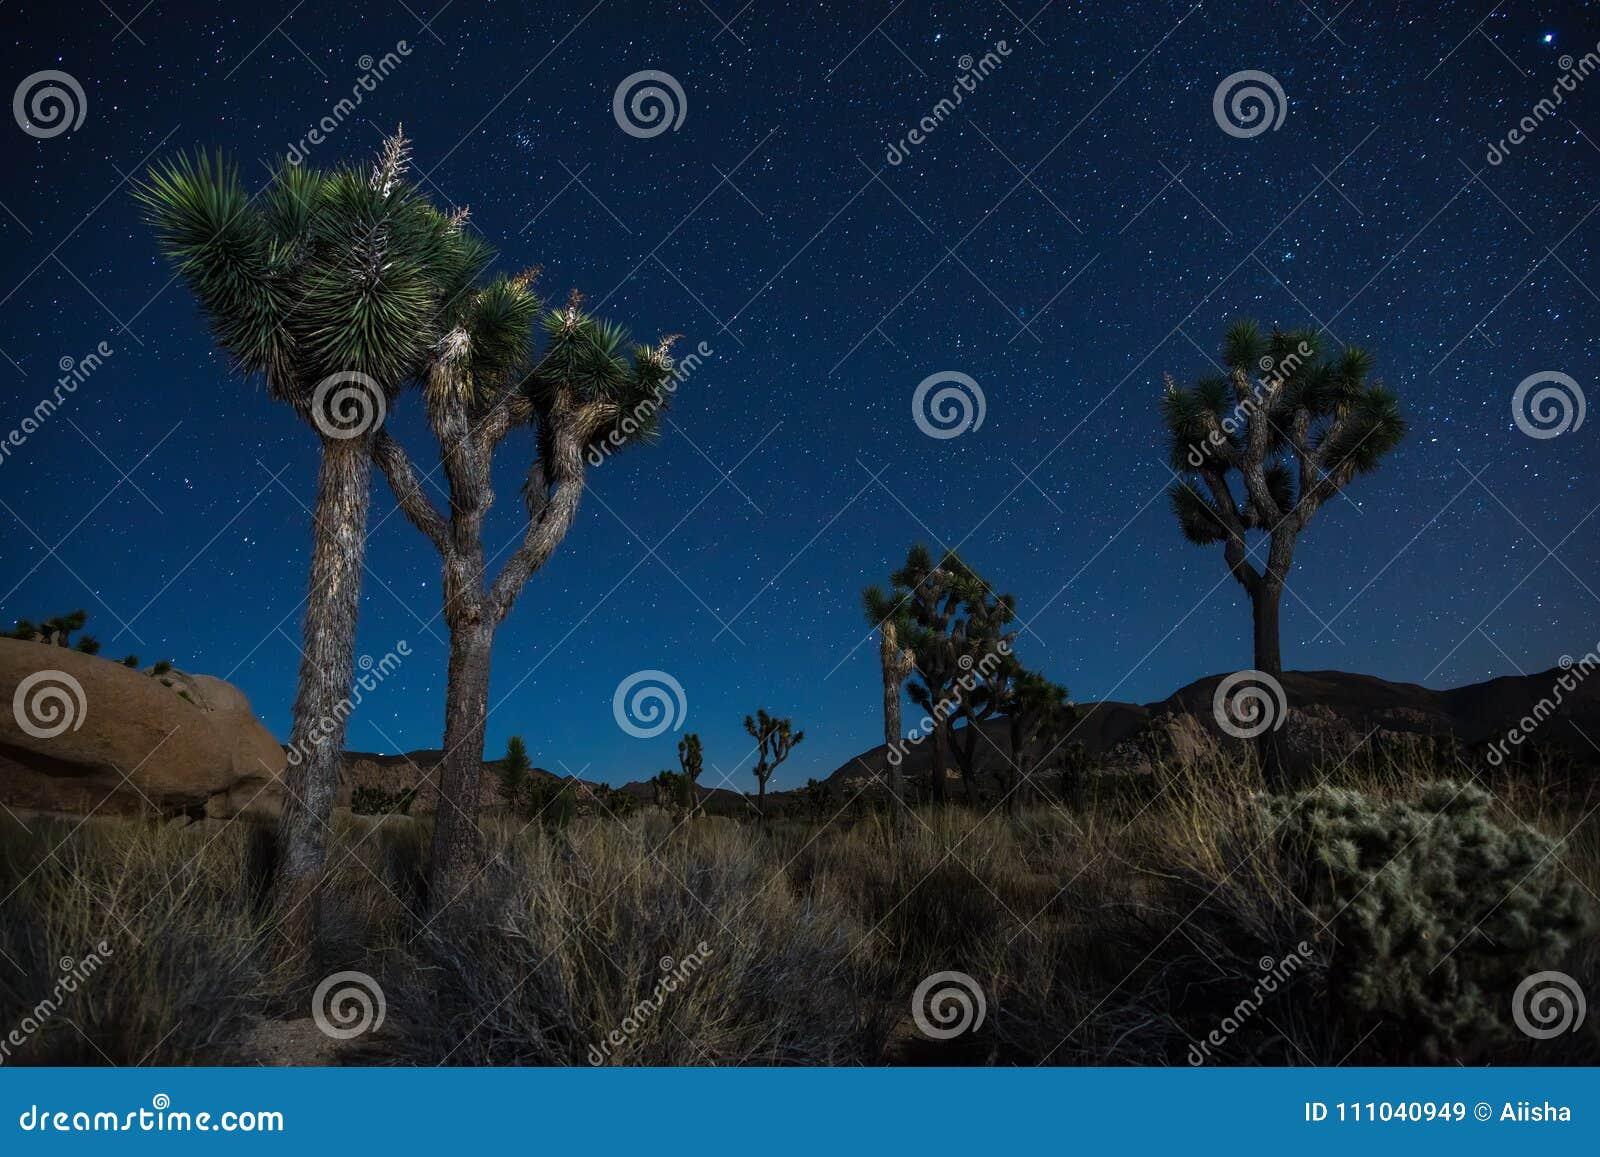 Joshua Trees At Night Stock Image Image Of Park Moon